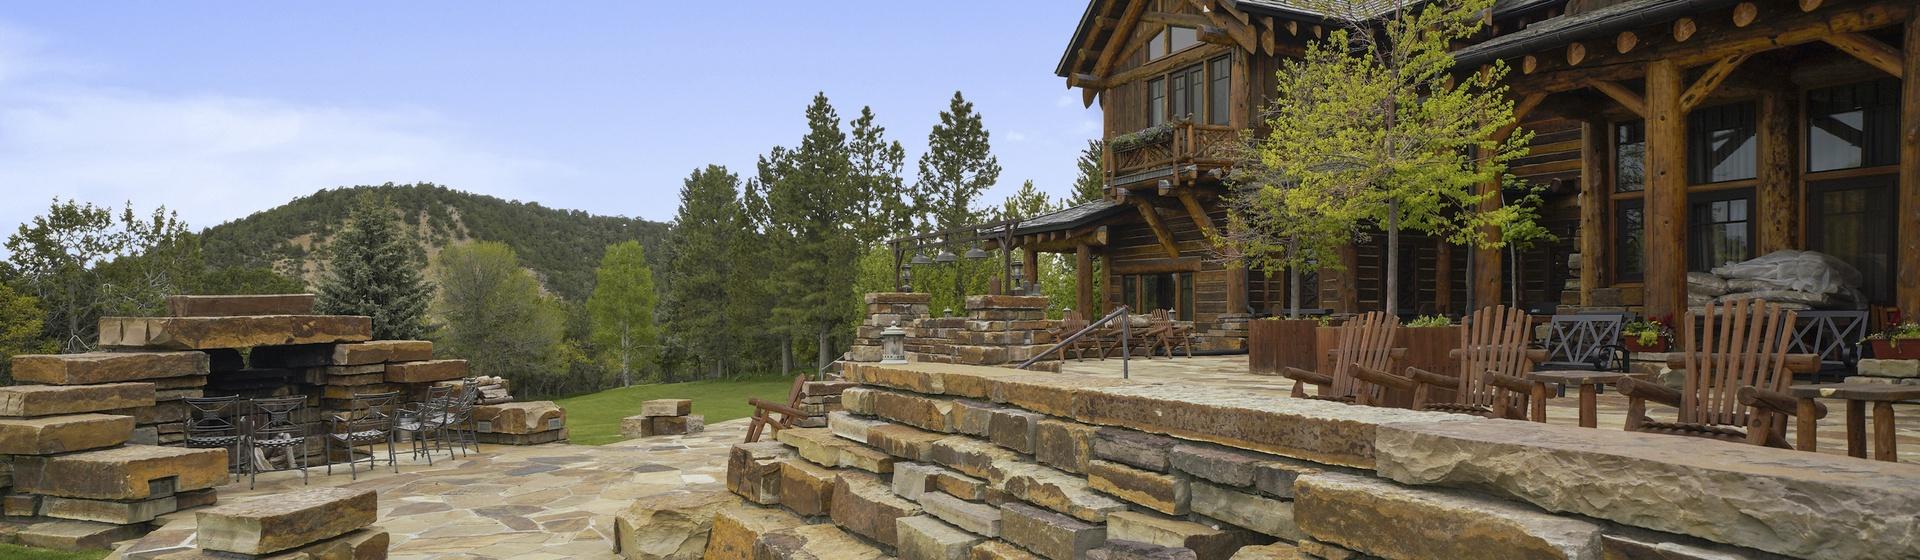 12.3-Telluride-Sleeping-Indian-Ranch-stone-terrace-sitting-area-web.JPG